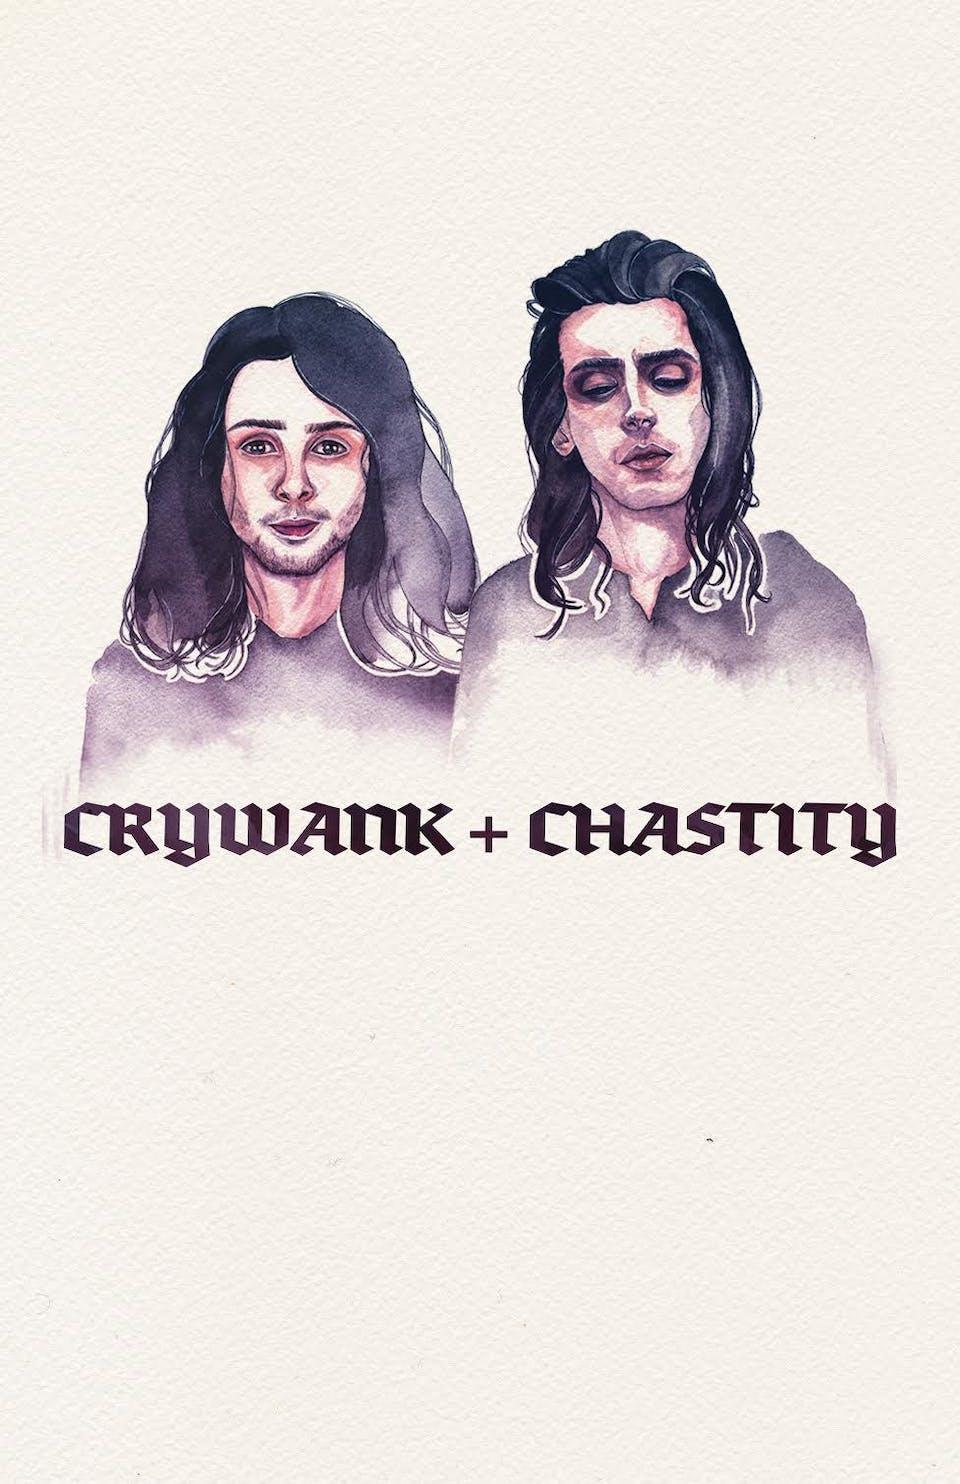 Crywank | Chastity